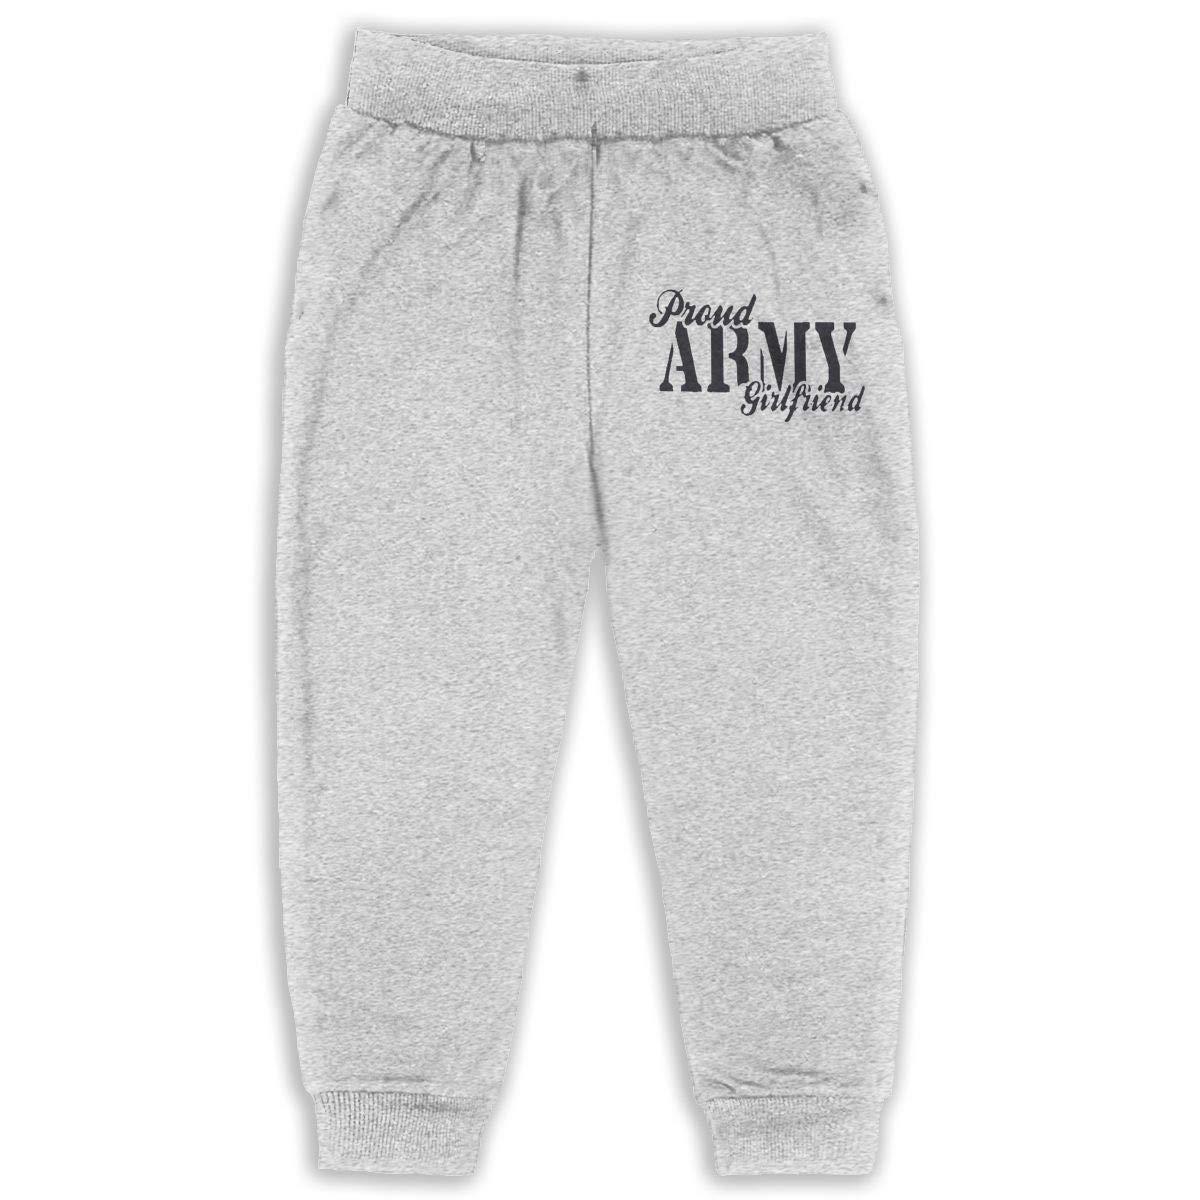 Fleece Active Joggers Elastic Pants Proud Army Girlfriend Design Sweatpants for Boys /& Girls